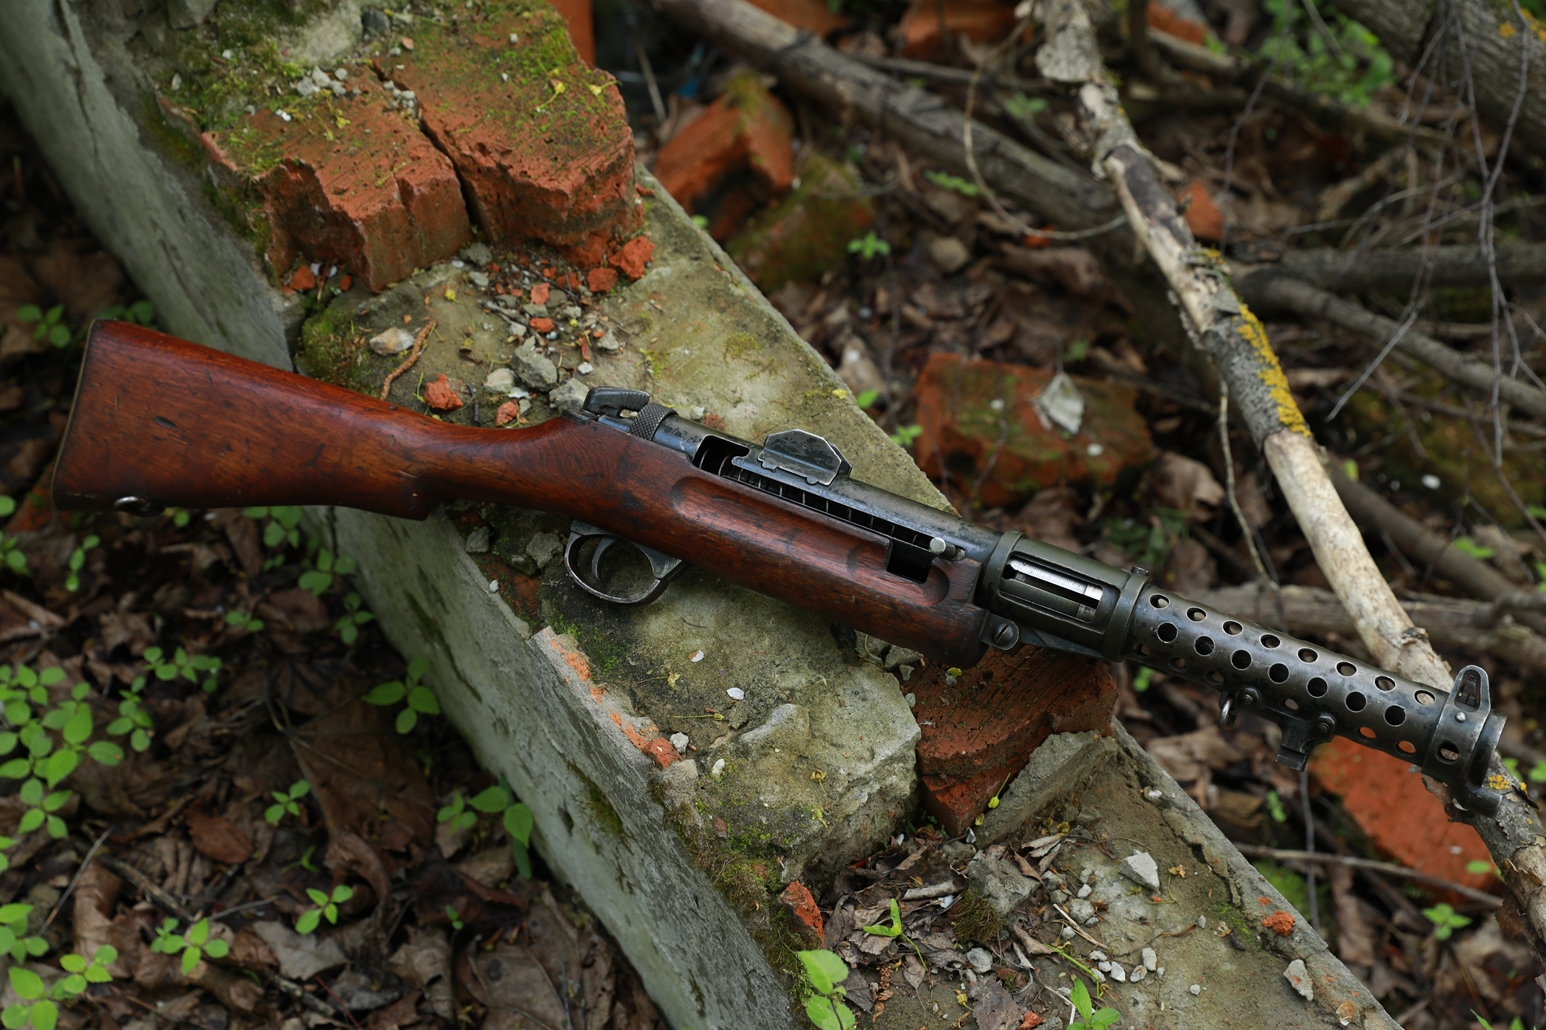 Пистолет-пулемет Lanchester MK.1 #60746, 1943 год